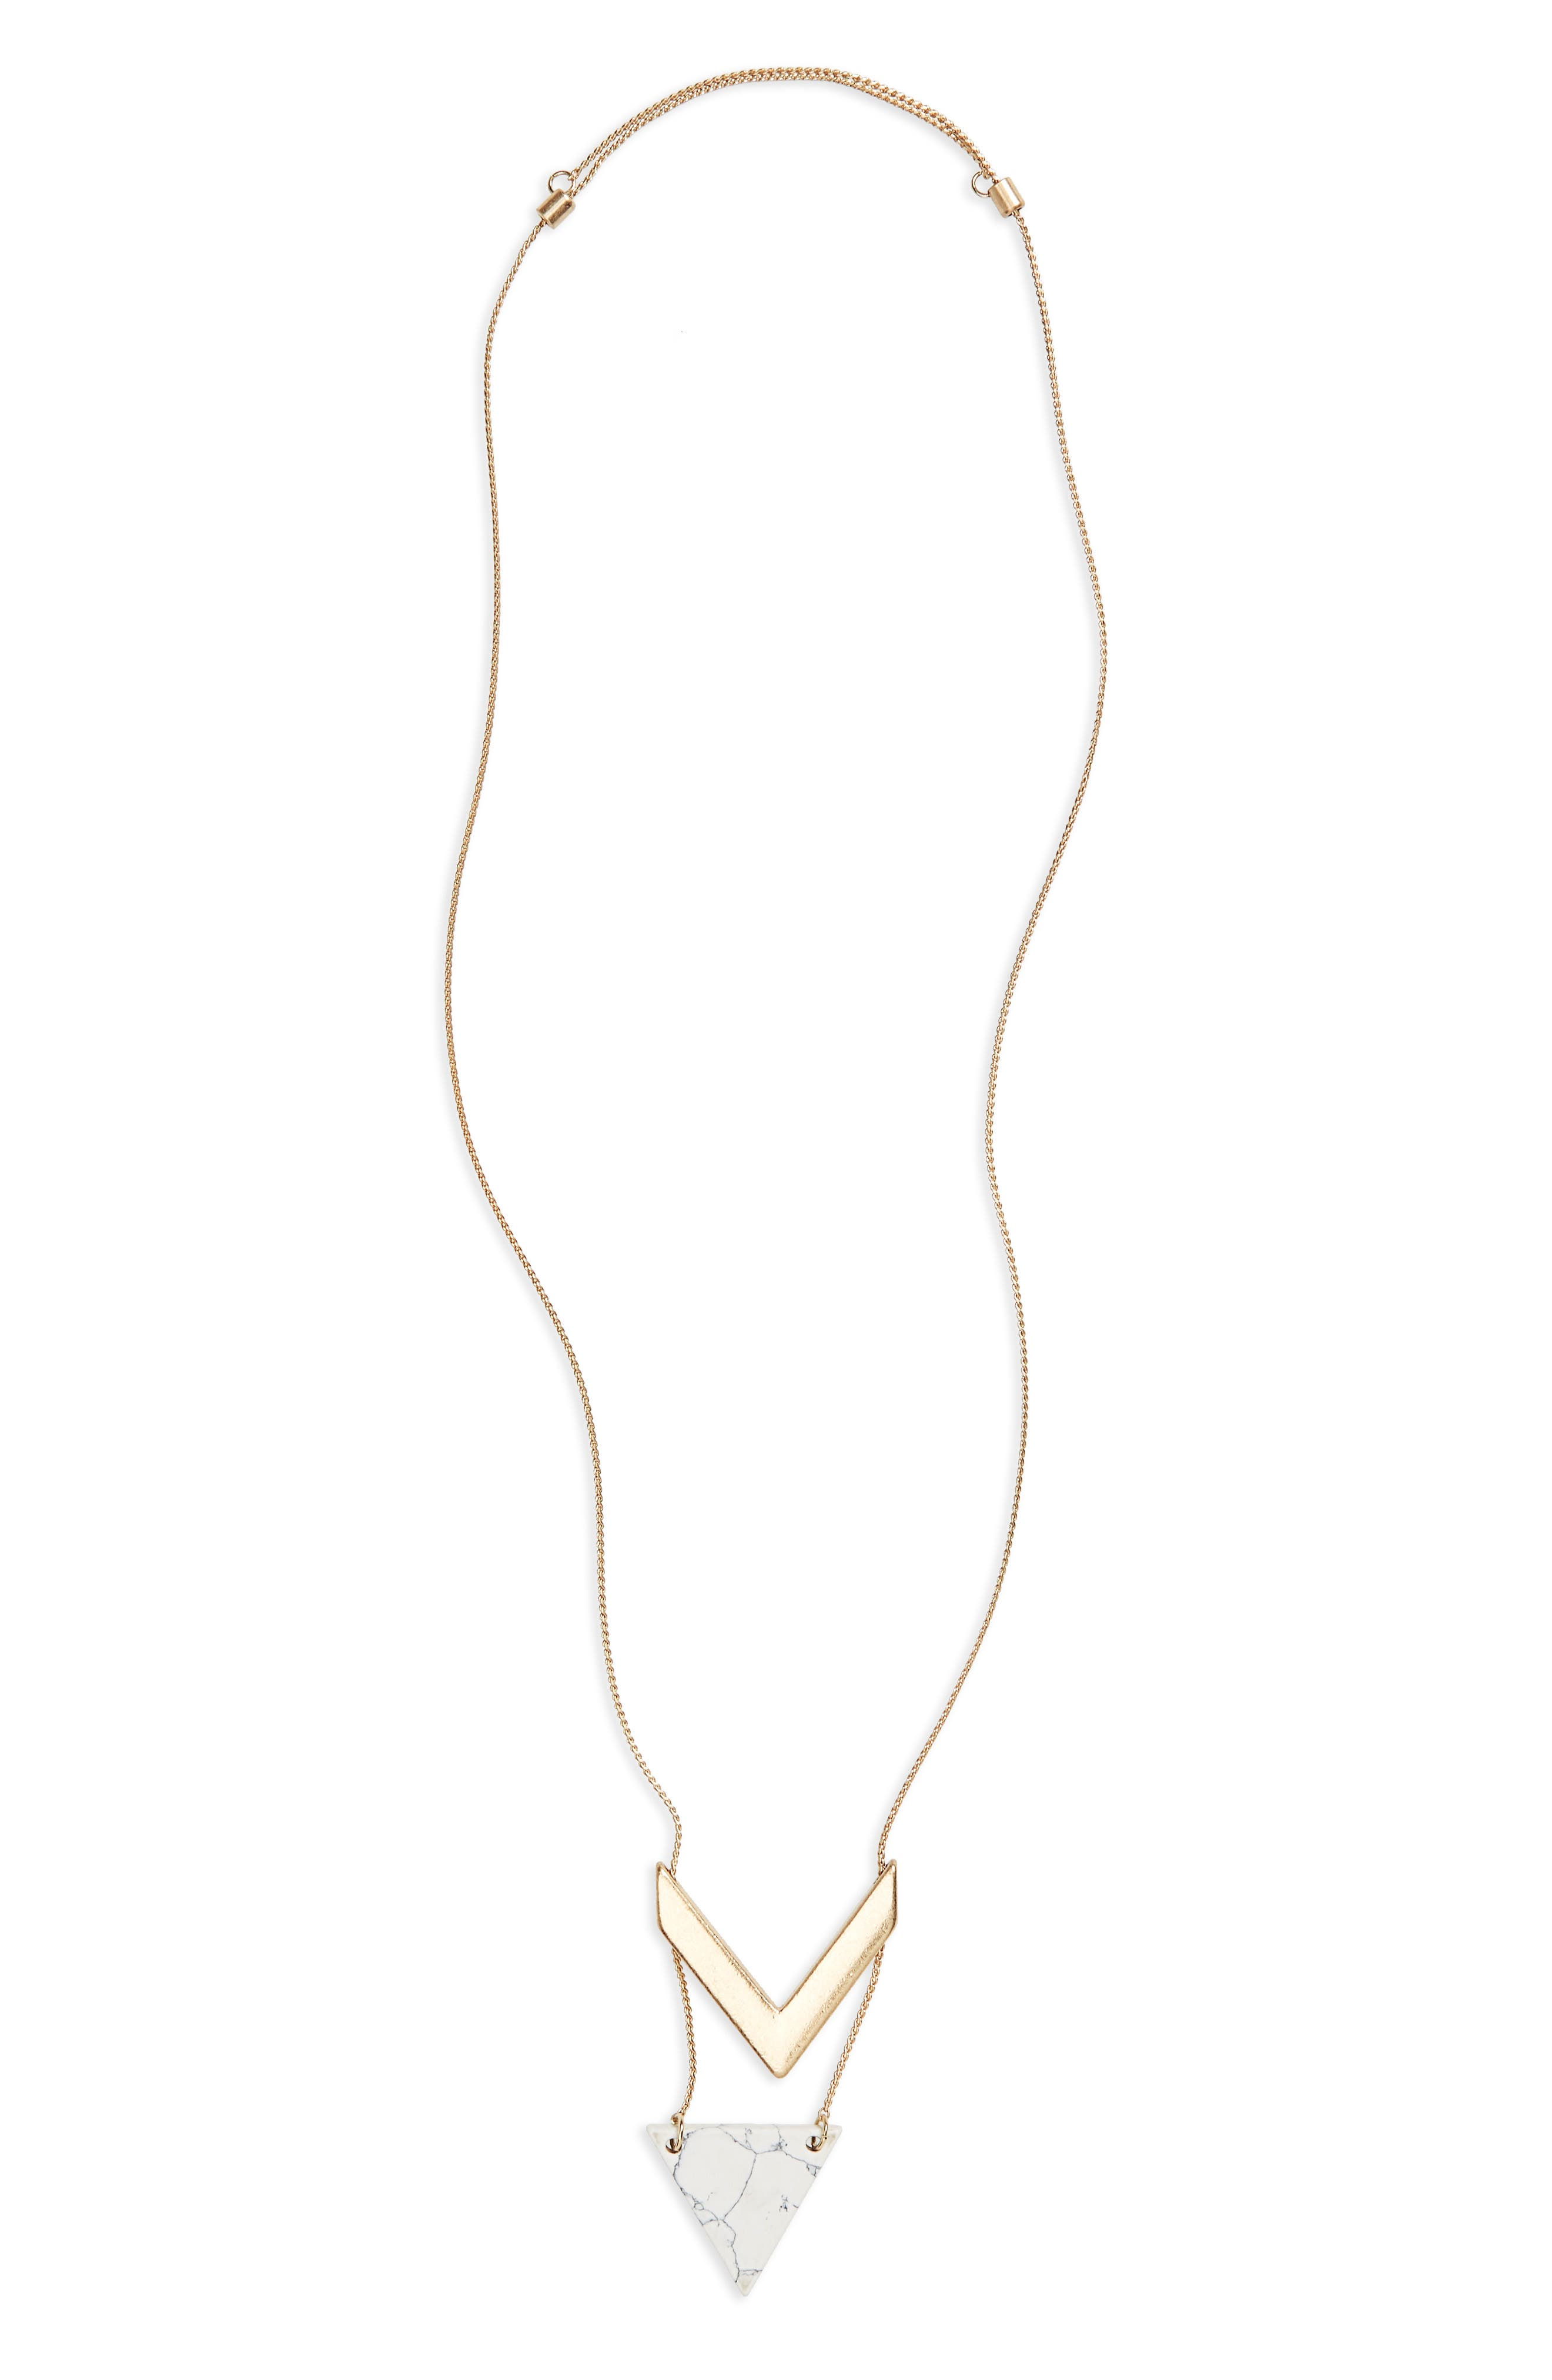 Stone Chevron Pendant Necklace,                             Main thumbnail 1, color,                             Gold/ Marble